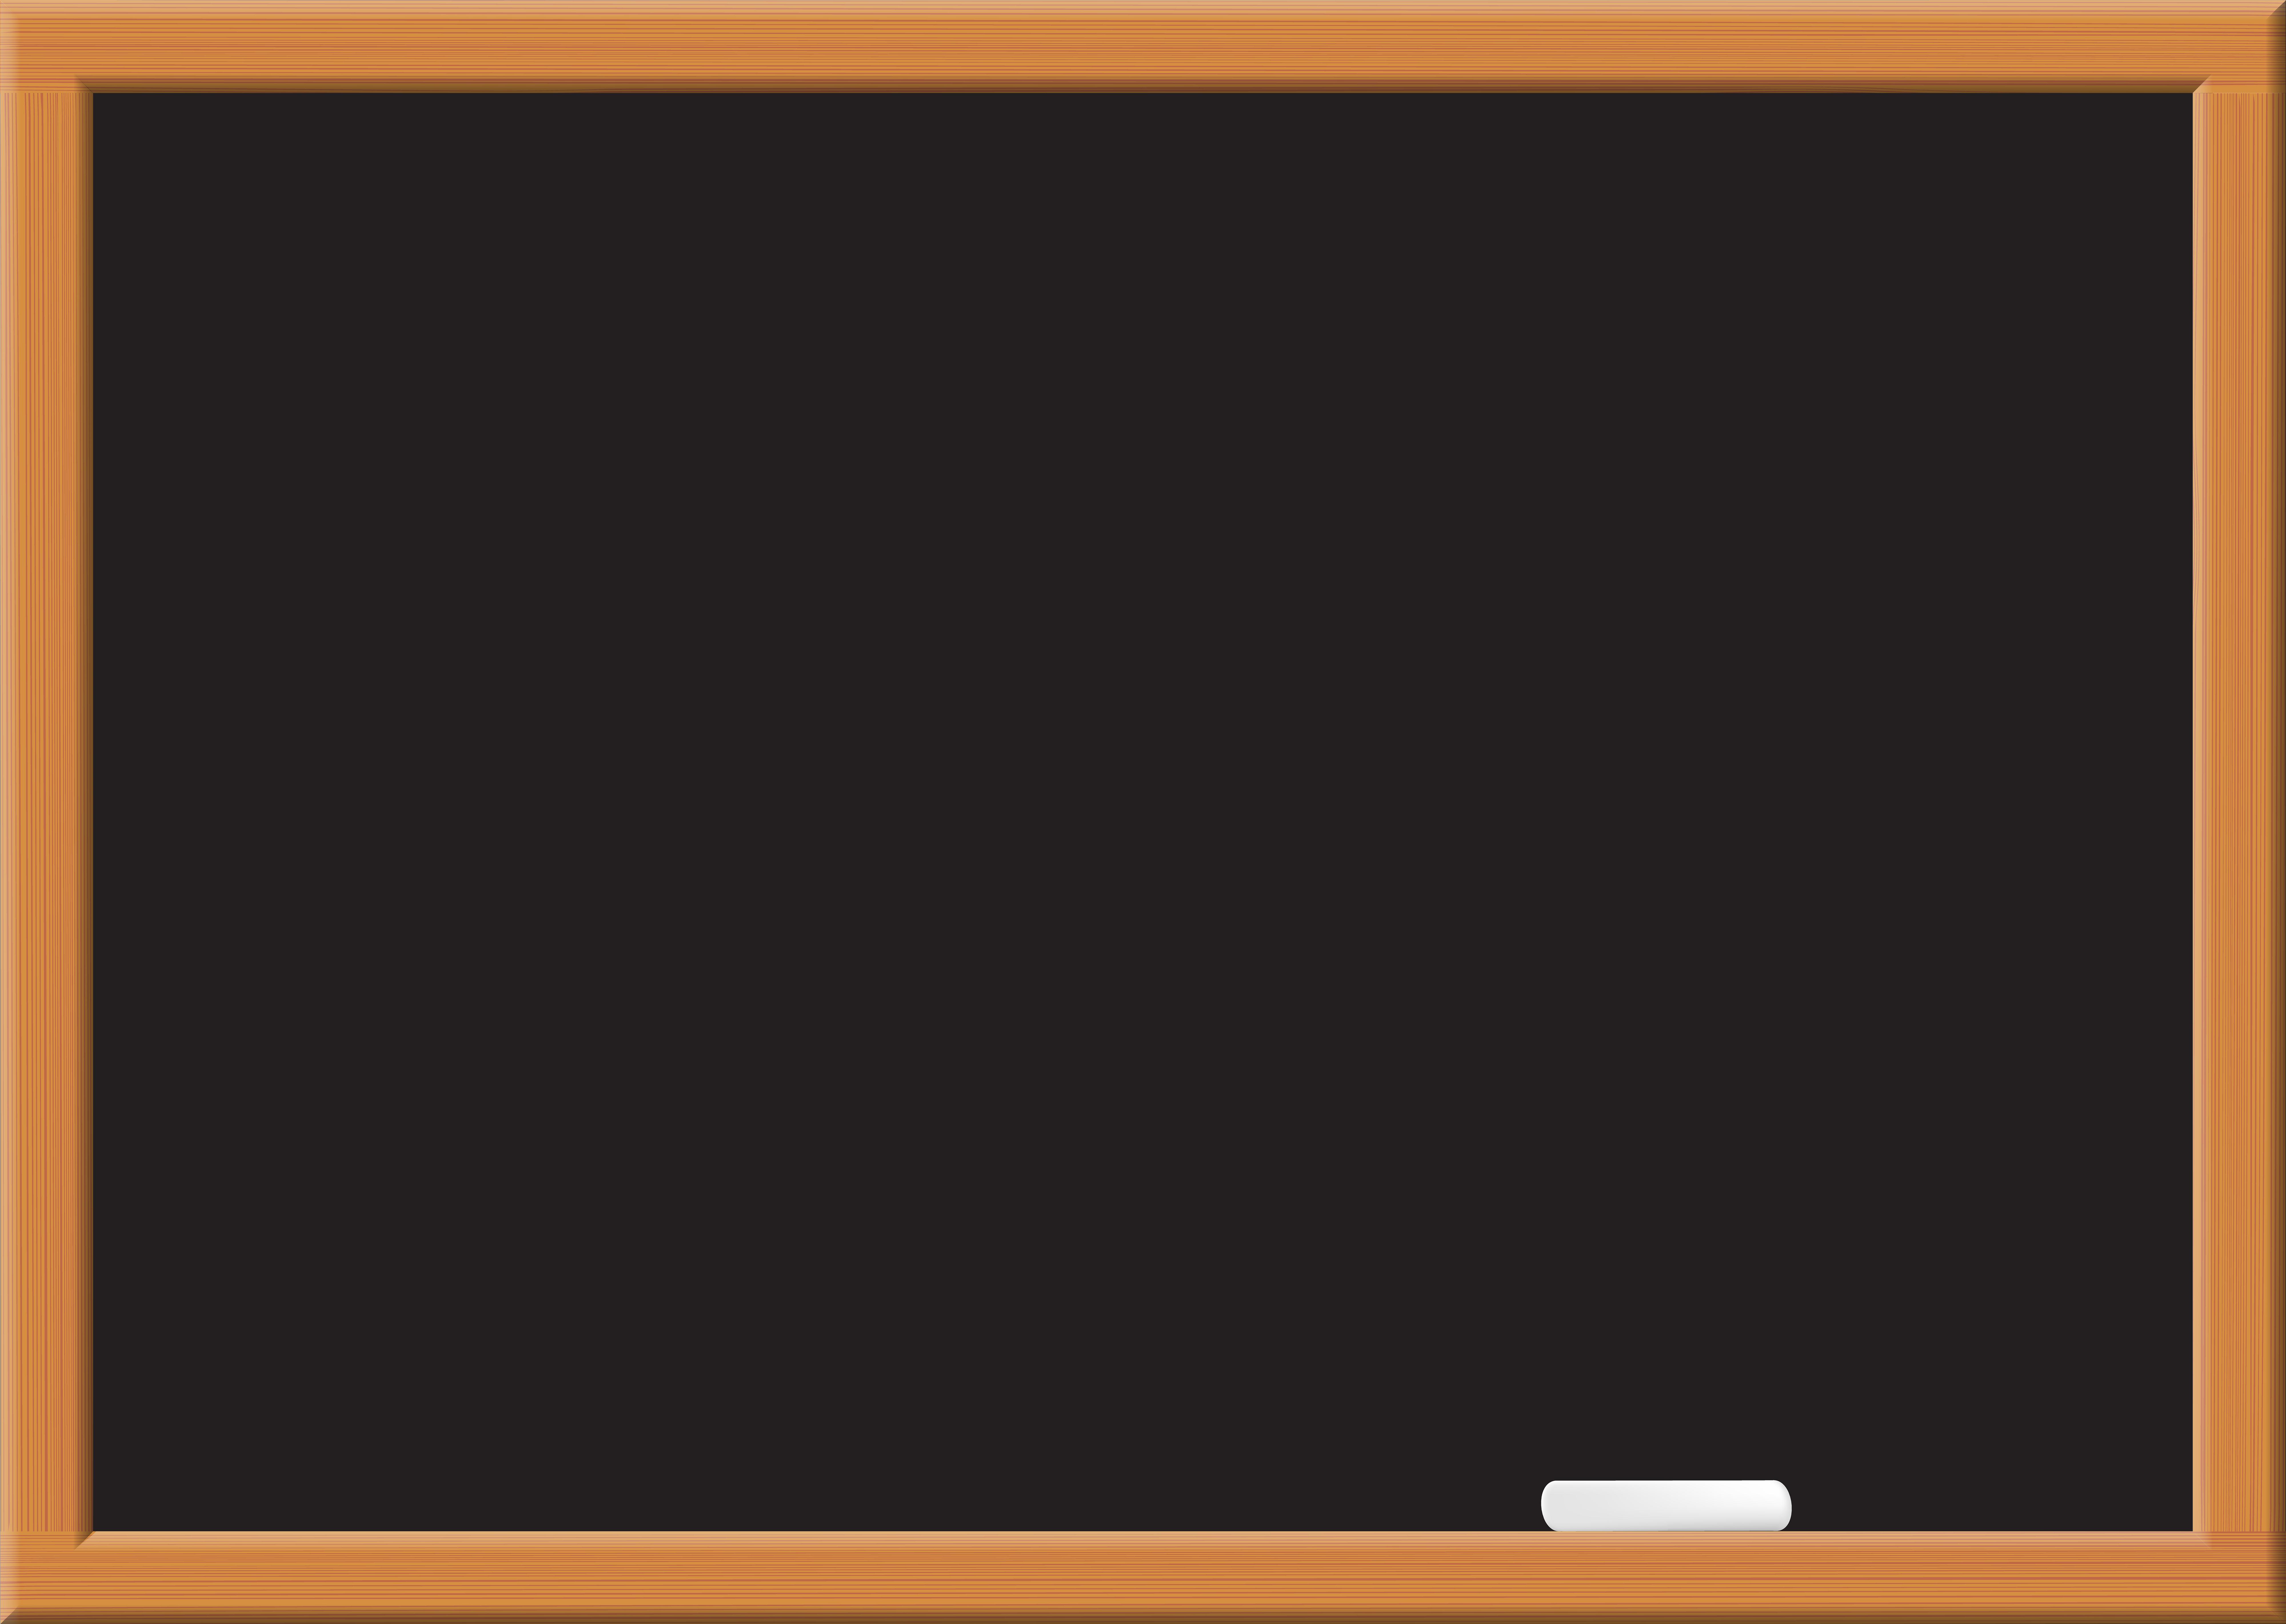 Png clip art image. Chalkboard clipart